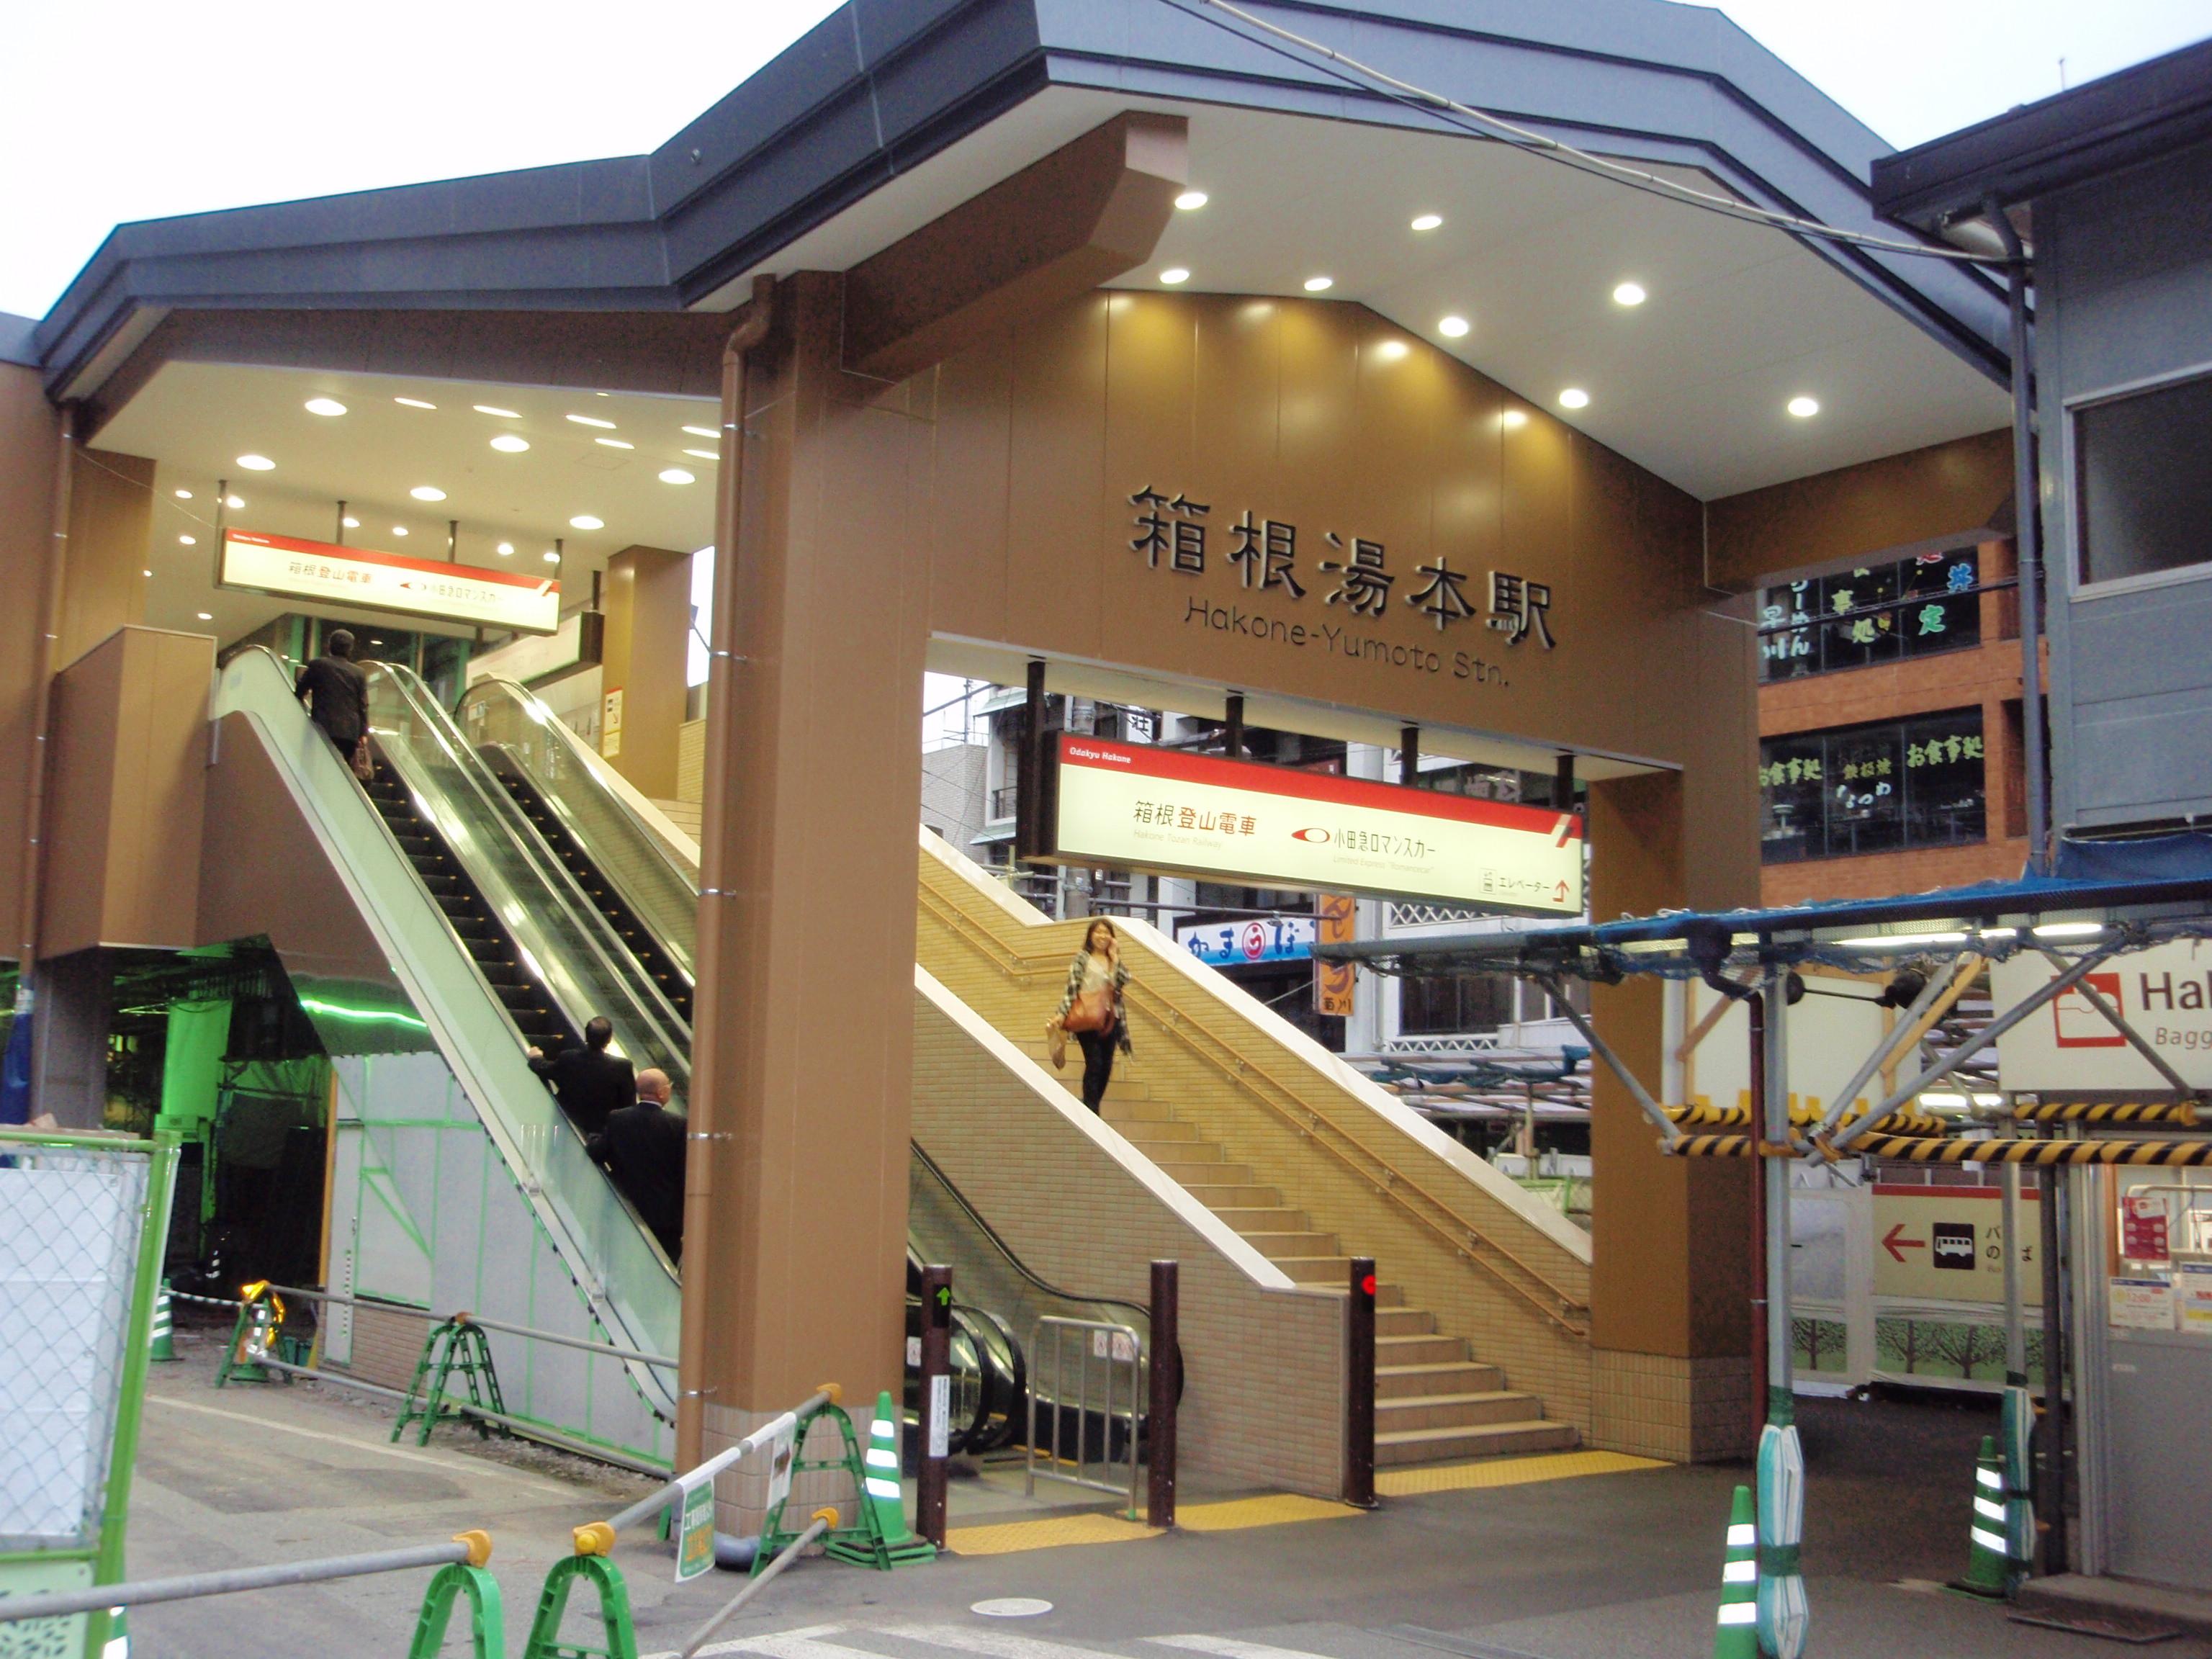 Hakone-Yumoto_Sta_2009